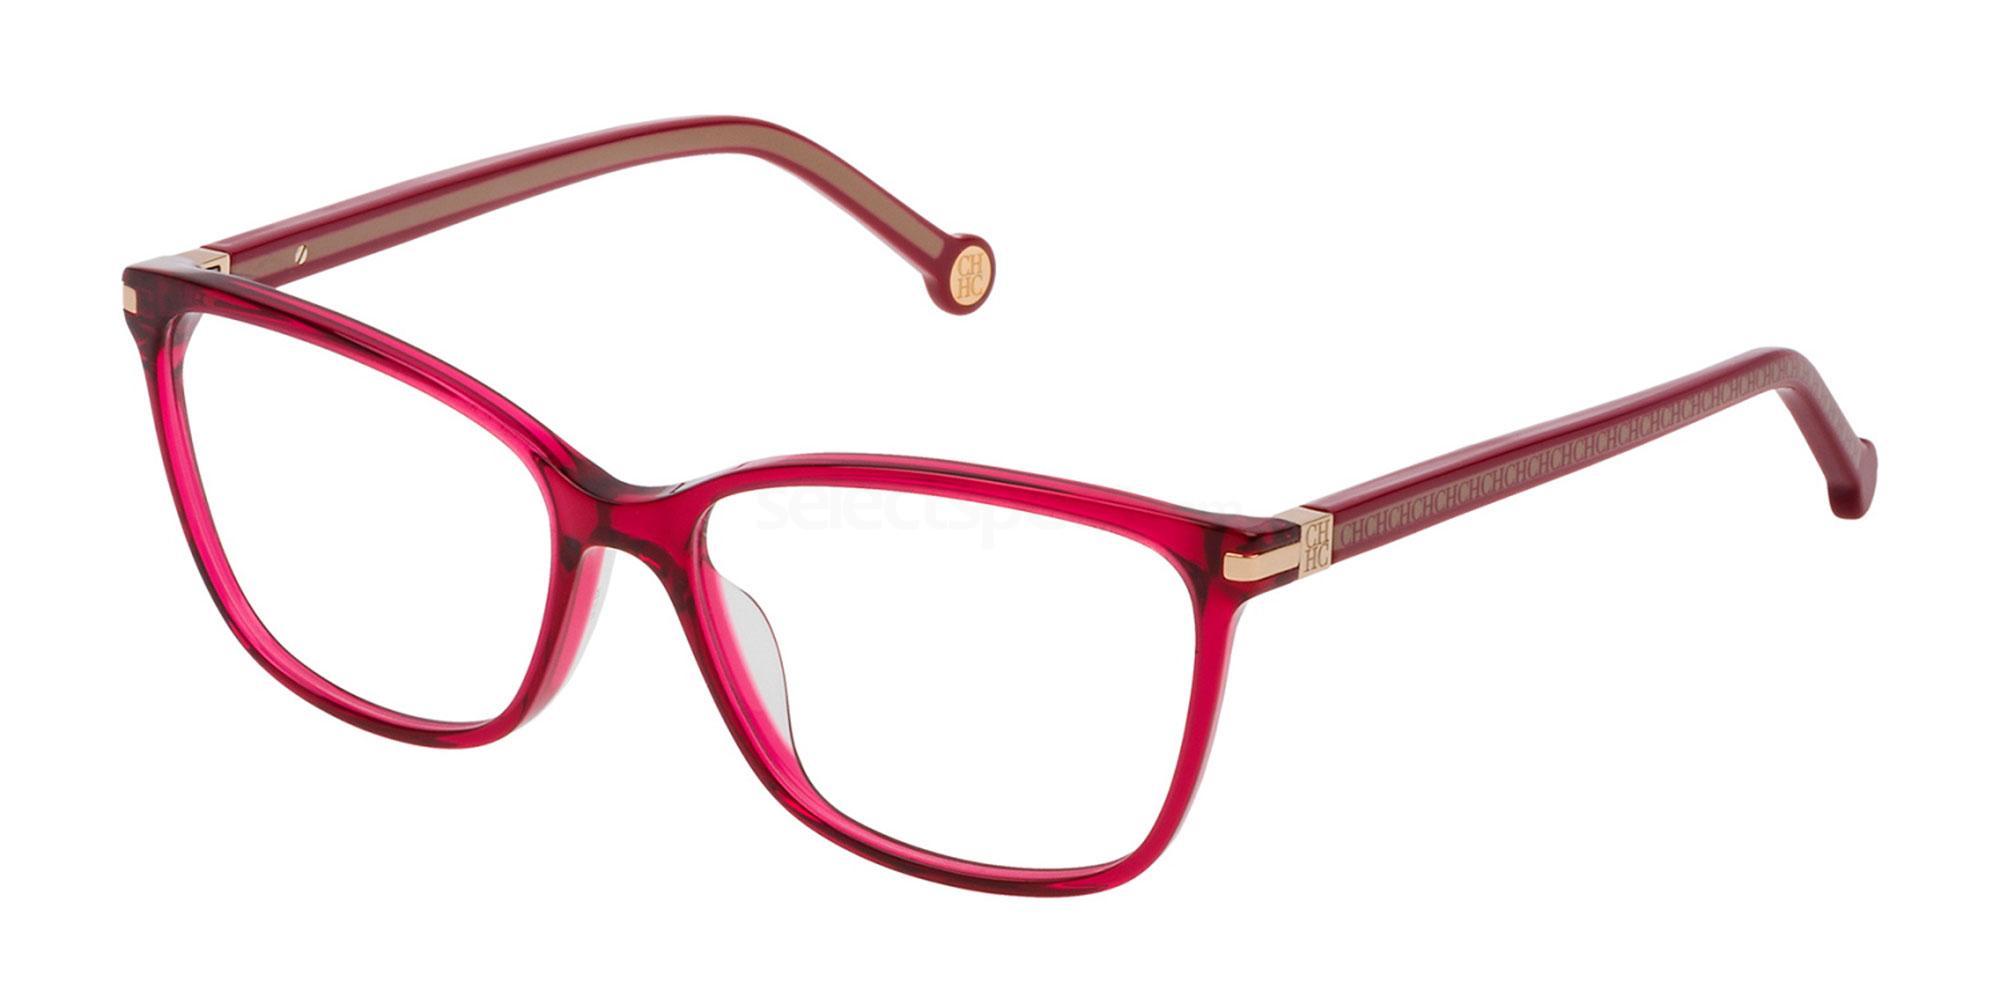 01BV VHE775 Glasses, CH Carolina Herrera